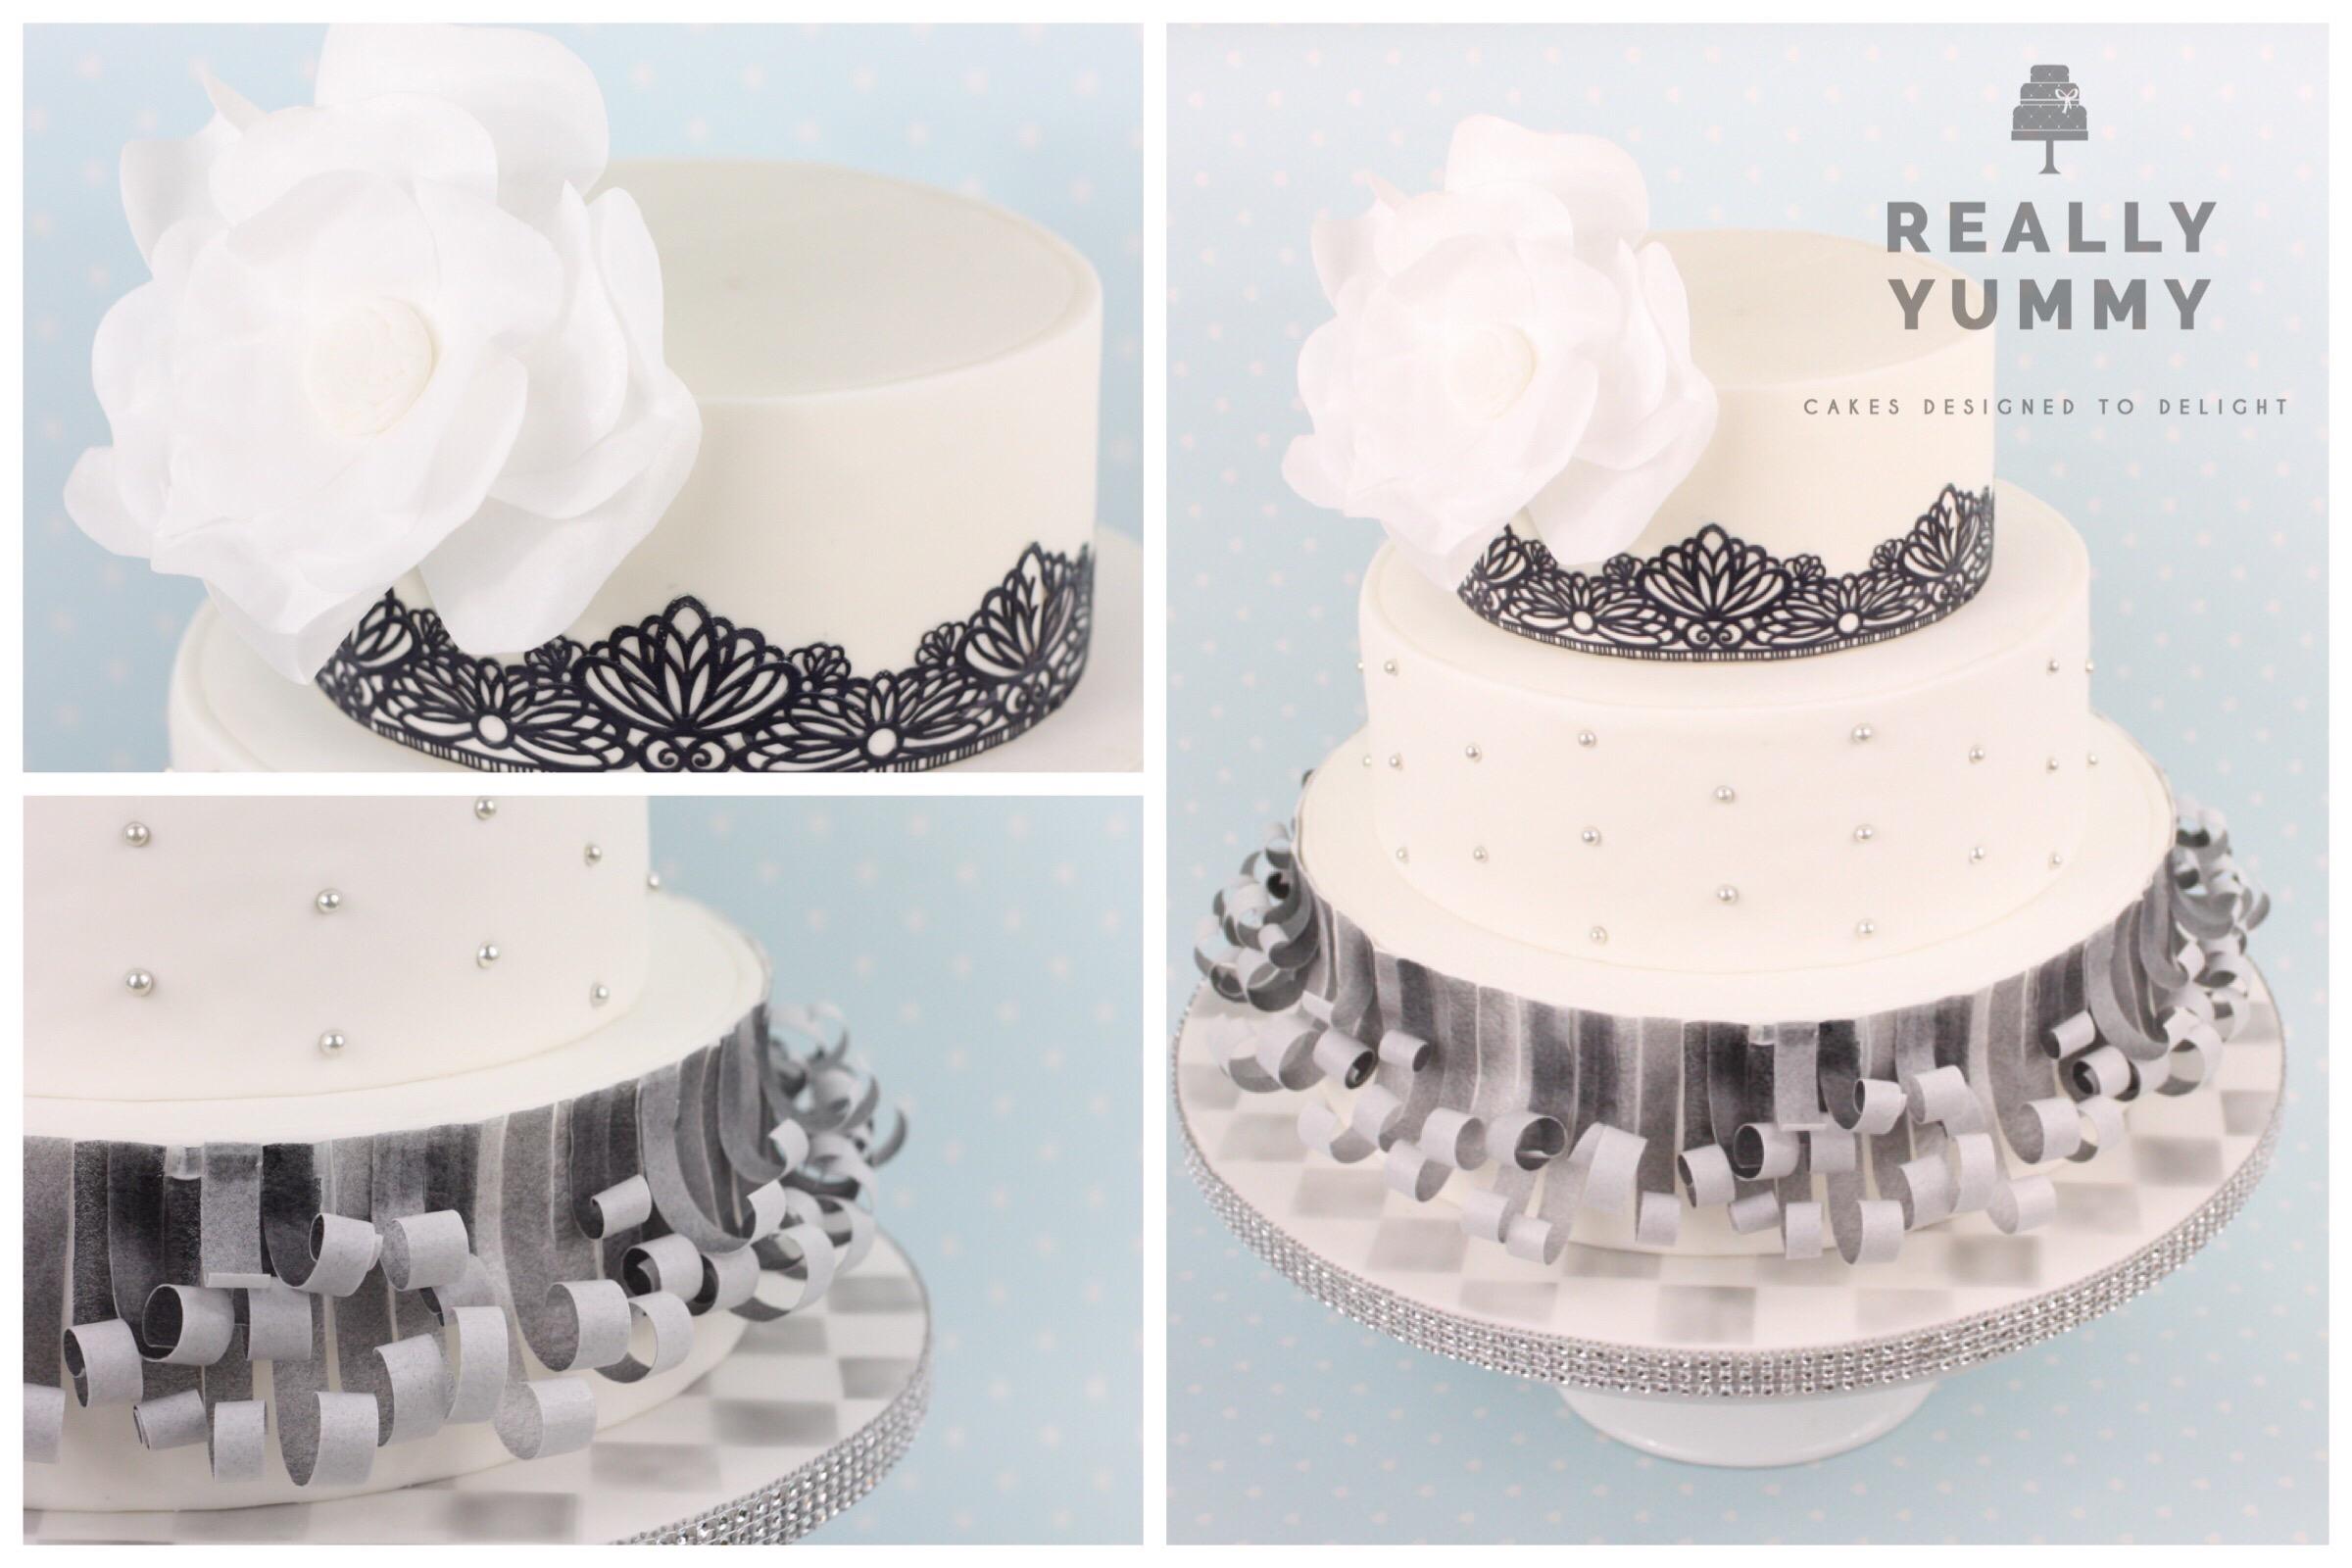 Monochrome cake with sparkle